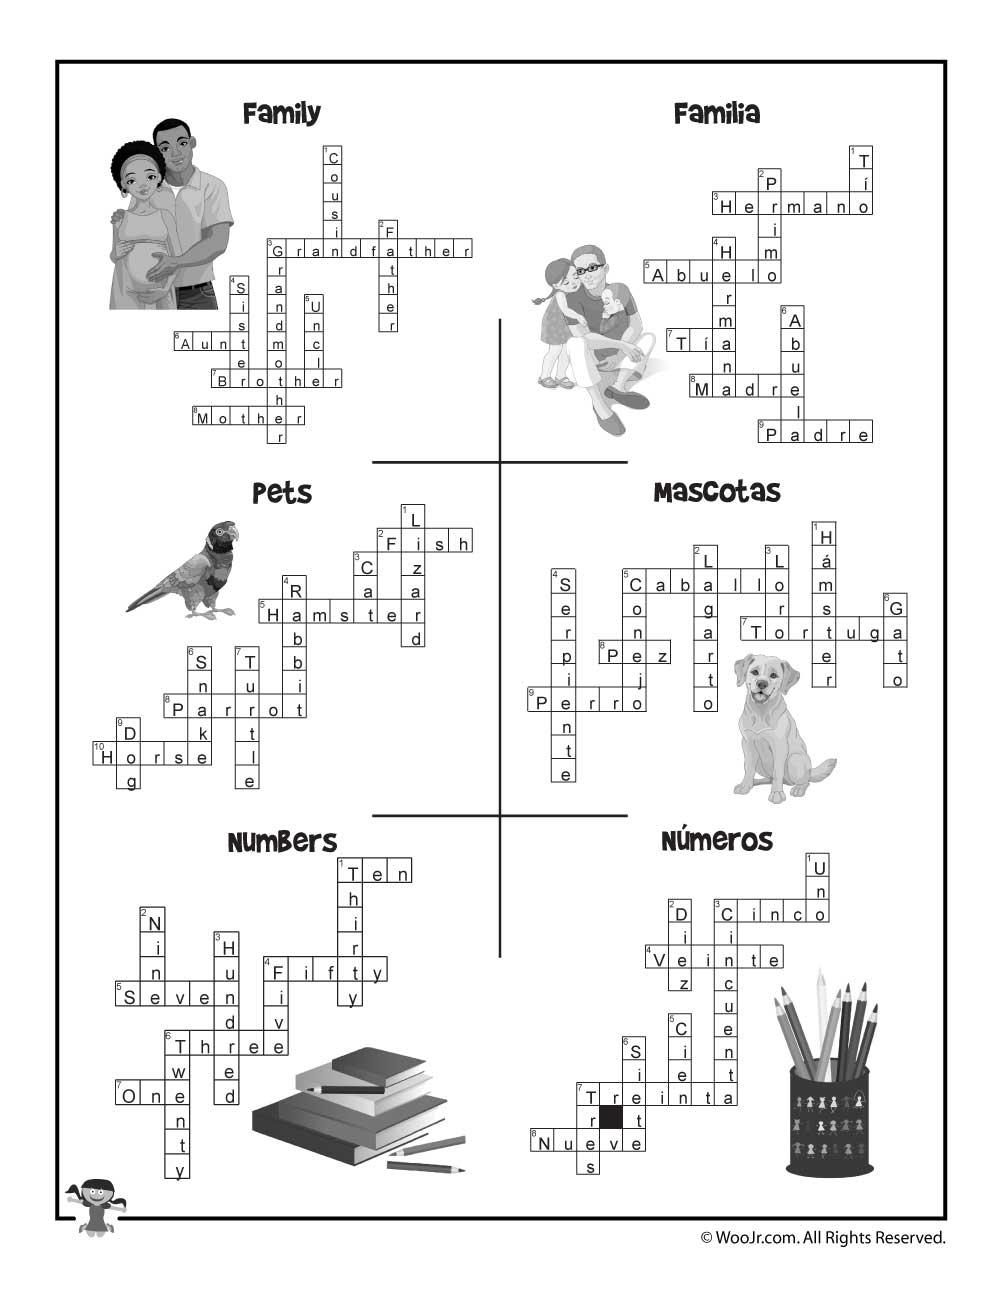 ESL Worksheet Crossword Puzzle Answers | Woo! Jr  Kids Activities